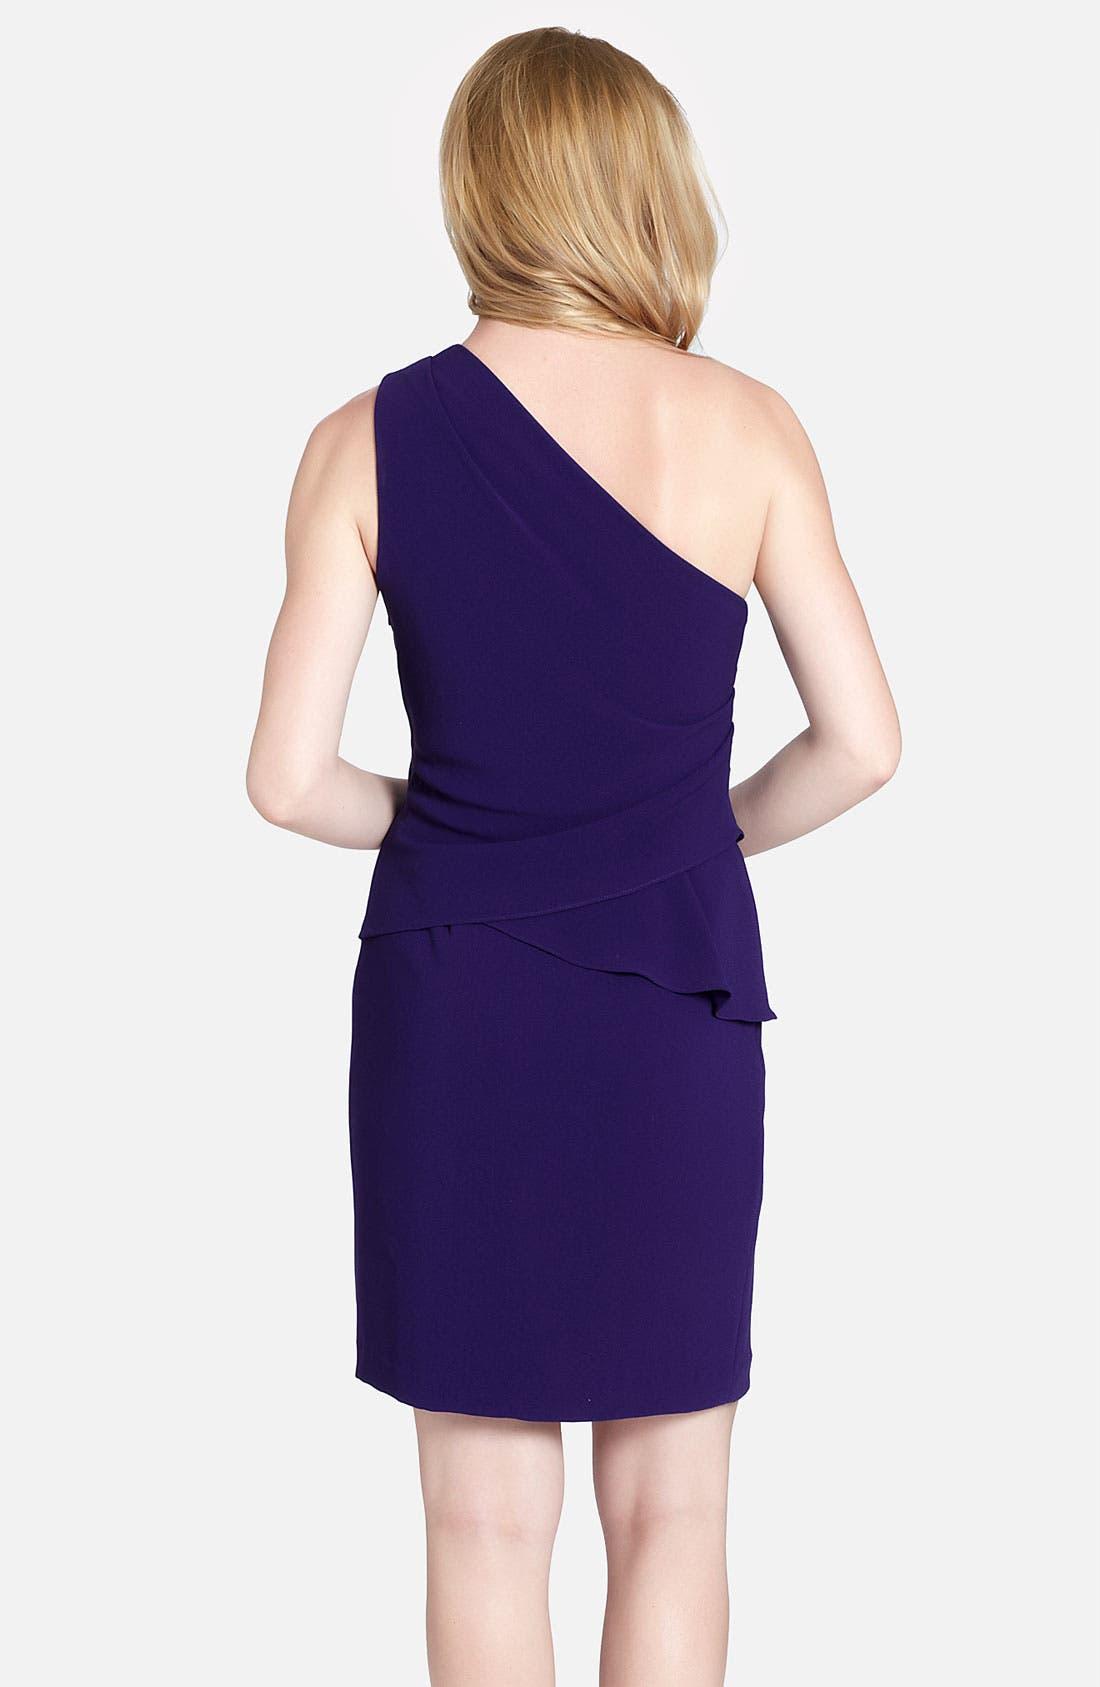 Alternate Image 2  - Cynthia Steffe 'Brielle' One Shoulder Side Peplum Dress